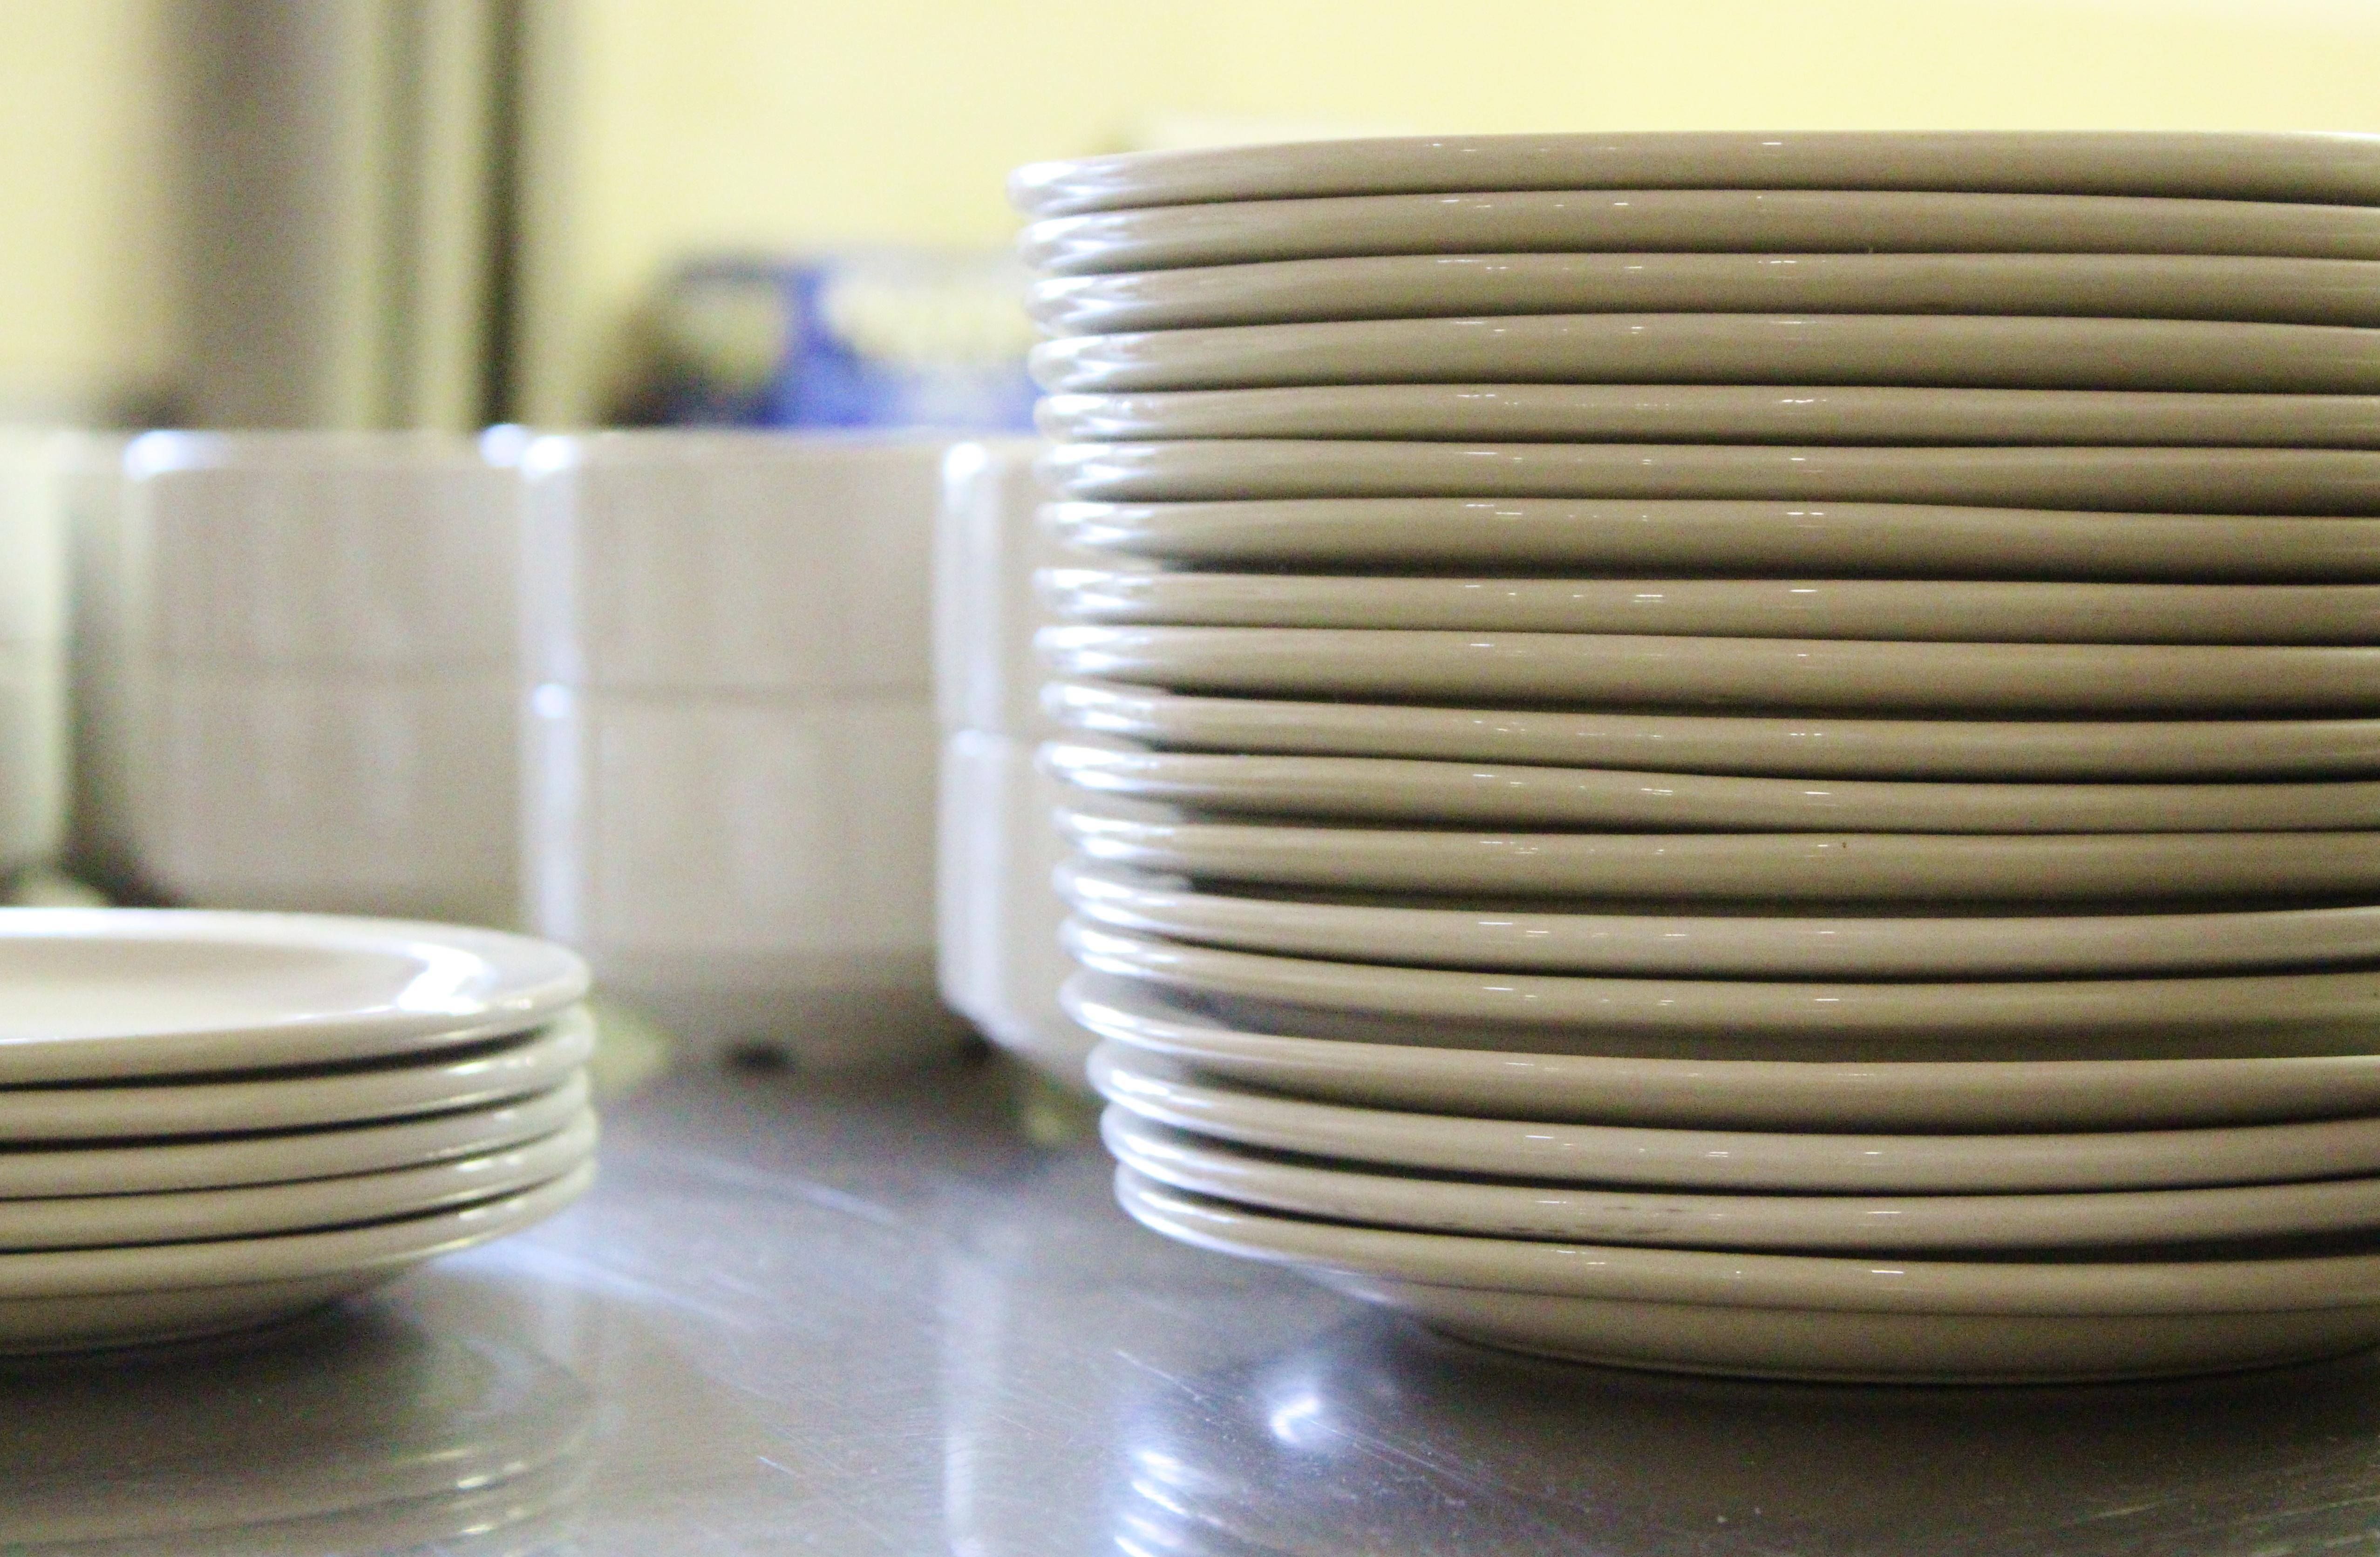 keramik teller geschirr keramik teller tasse antik geschirr vase krug kanne knnchen in leipzig. Black Bedroom Furniture Sets. Home Design Ideas